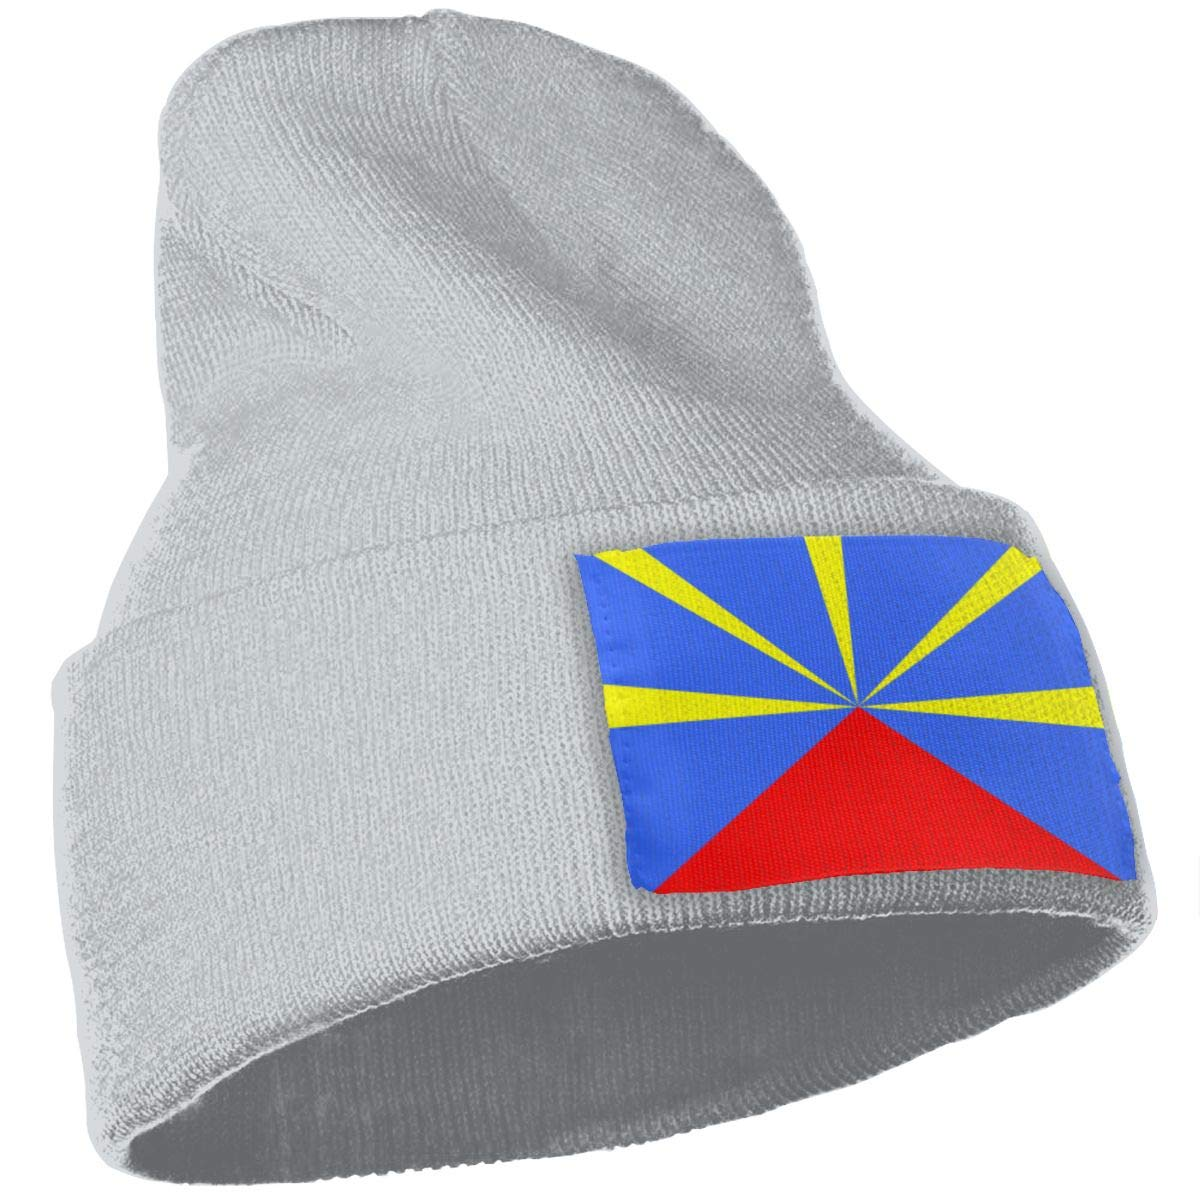 Thick MACA Reunion Unisex Slouch Beanie Hats Warm /& Stylish Winter Hats Black